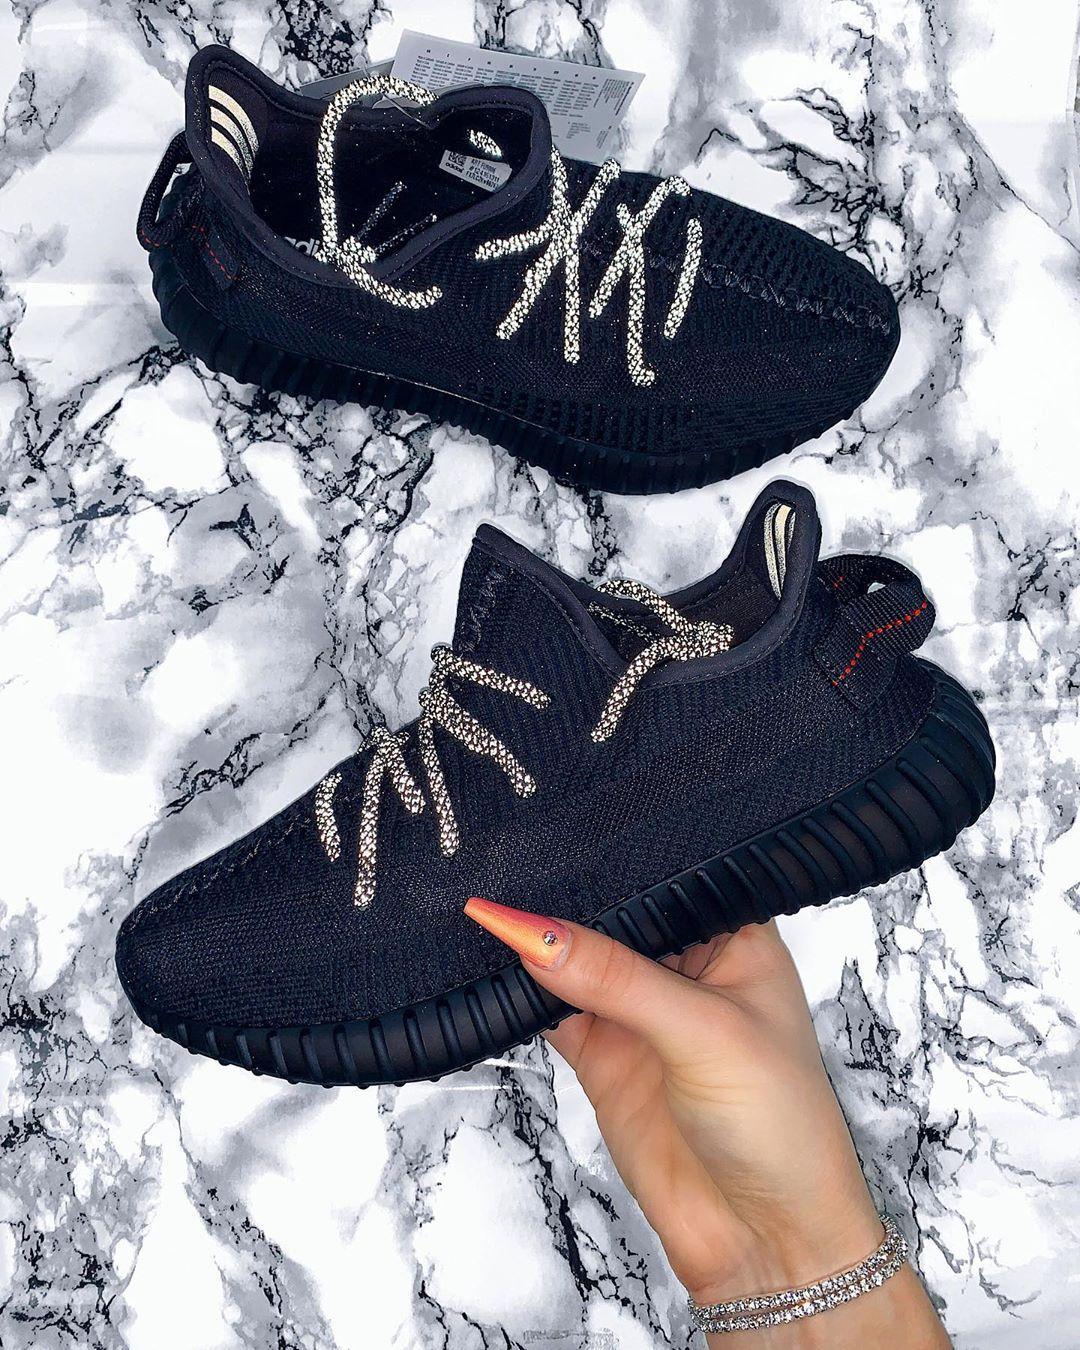 Yeezy Boost 350 V2 Black (Non Reflective) en 2020 | Sneakers